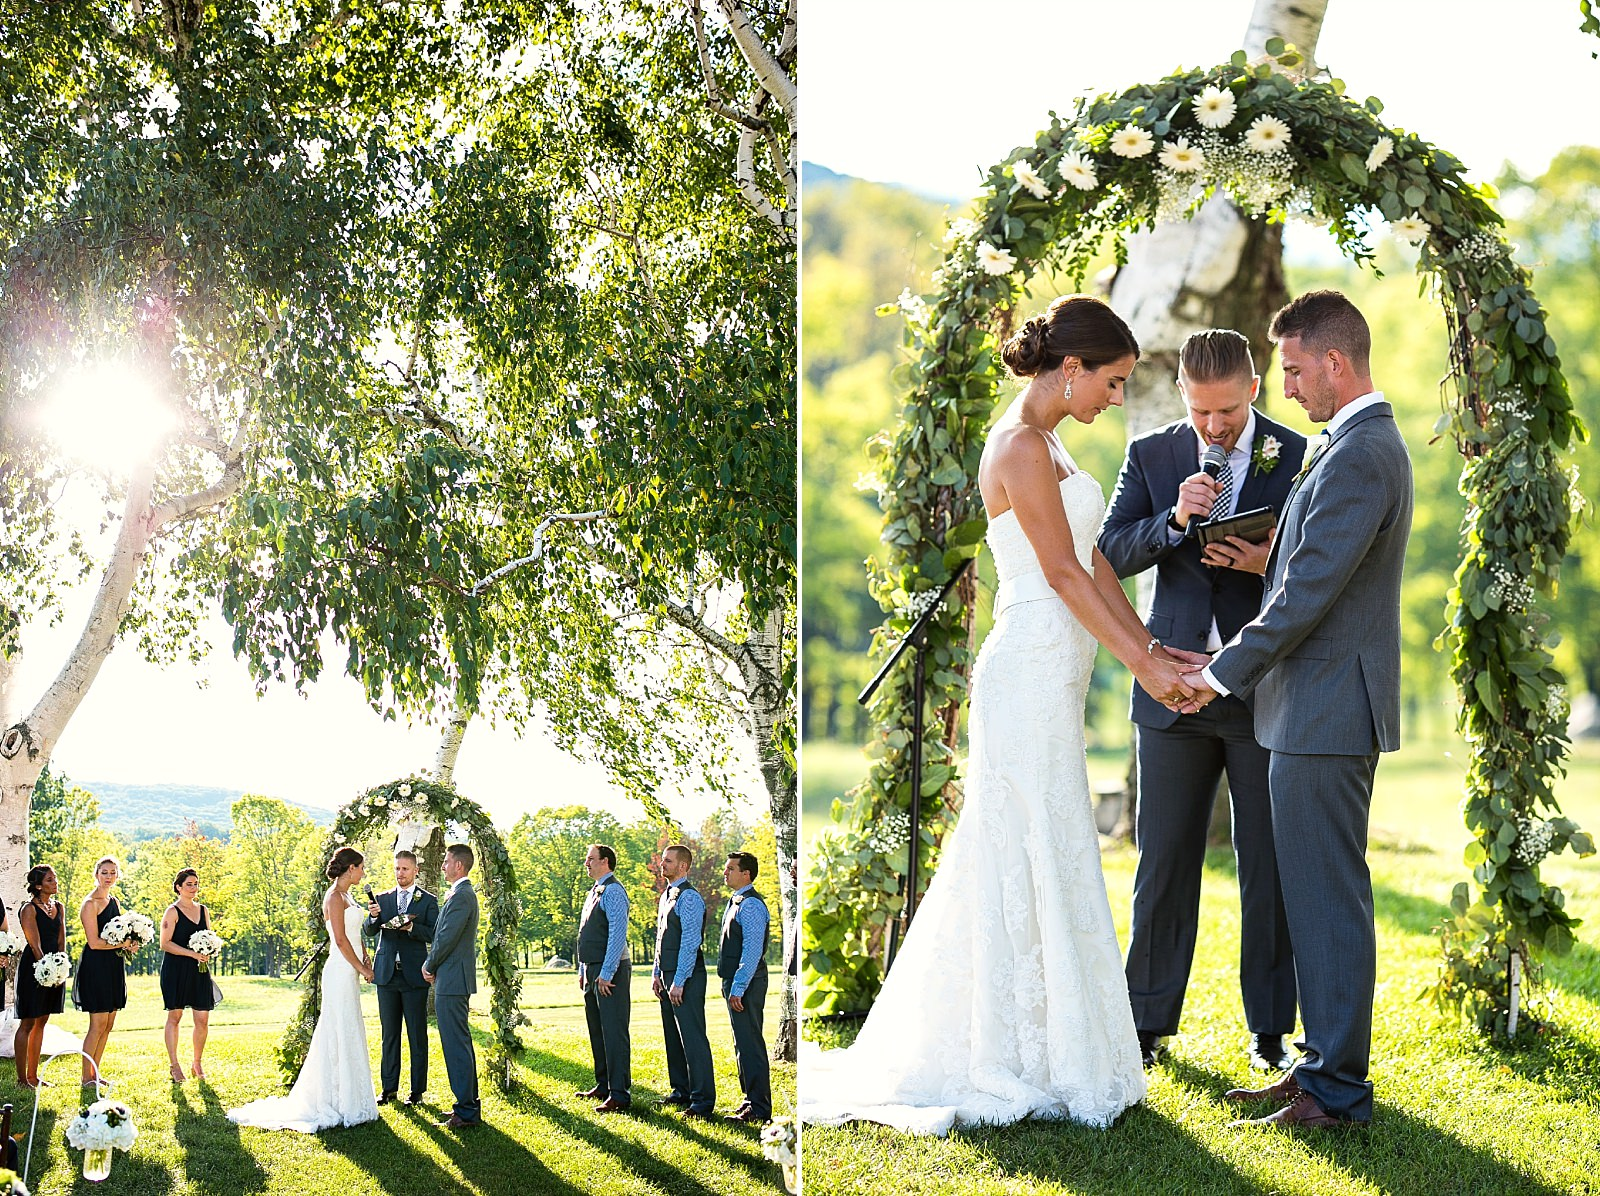 CT_Wedding_Photographer_LiNa_Wed_43.jpg